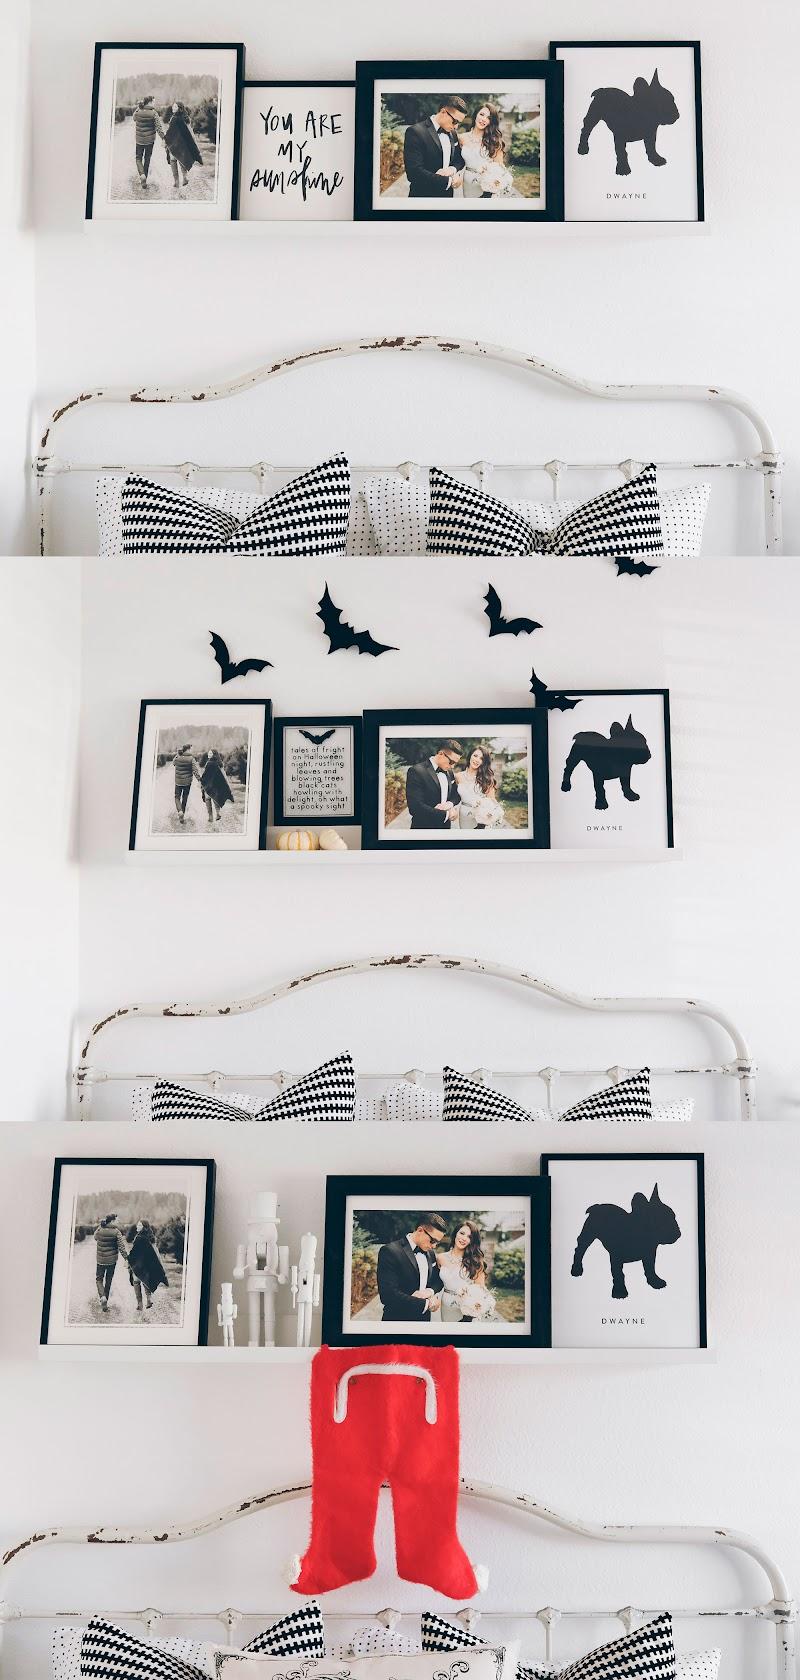 Cool Modern Bedroom Gallery Wall wallpaper